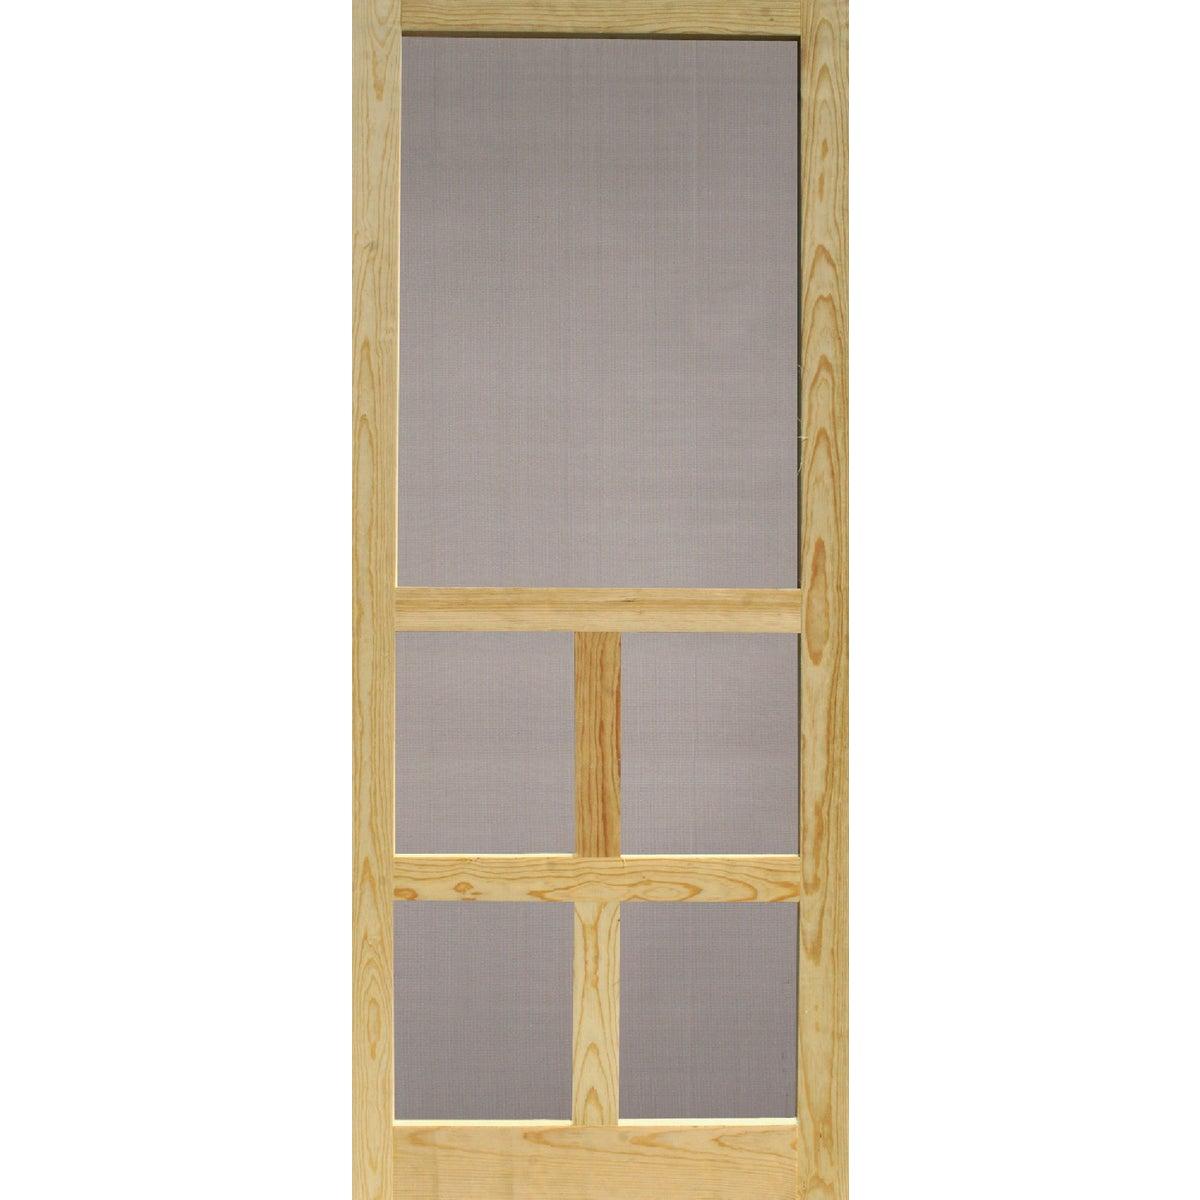 "30"" SEVILLA SCREEN DOOR - 2668 SEVILLA by Wood Prod Manufactur"